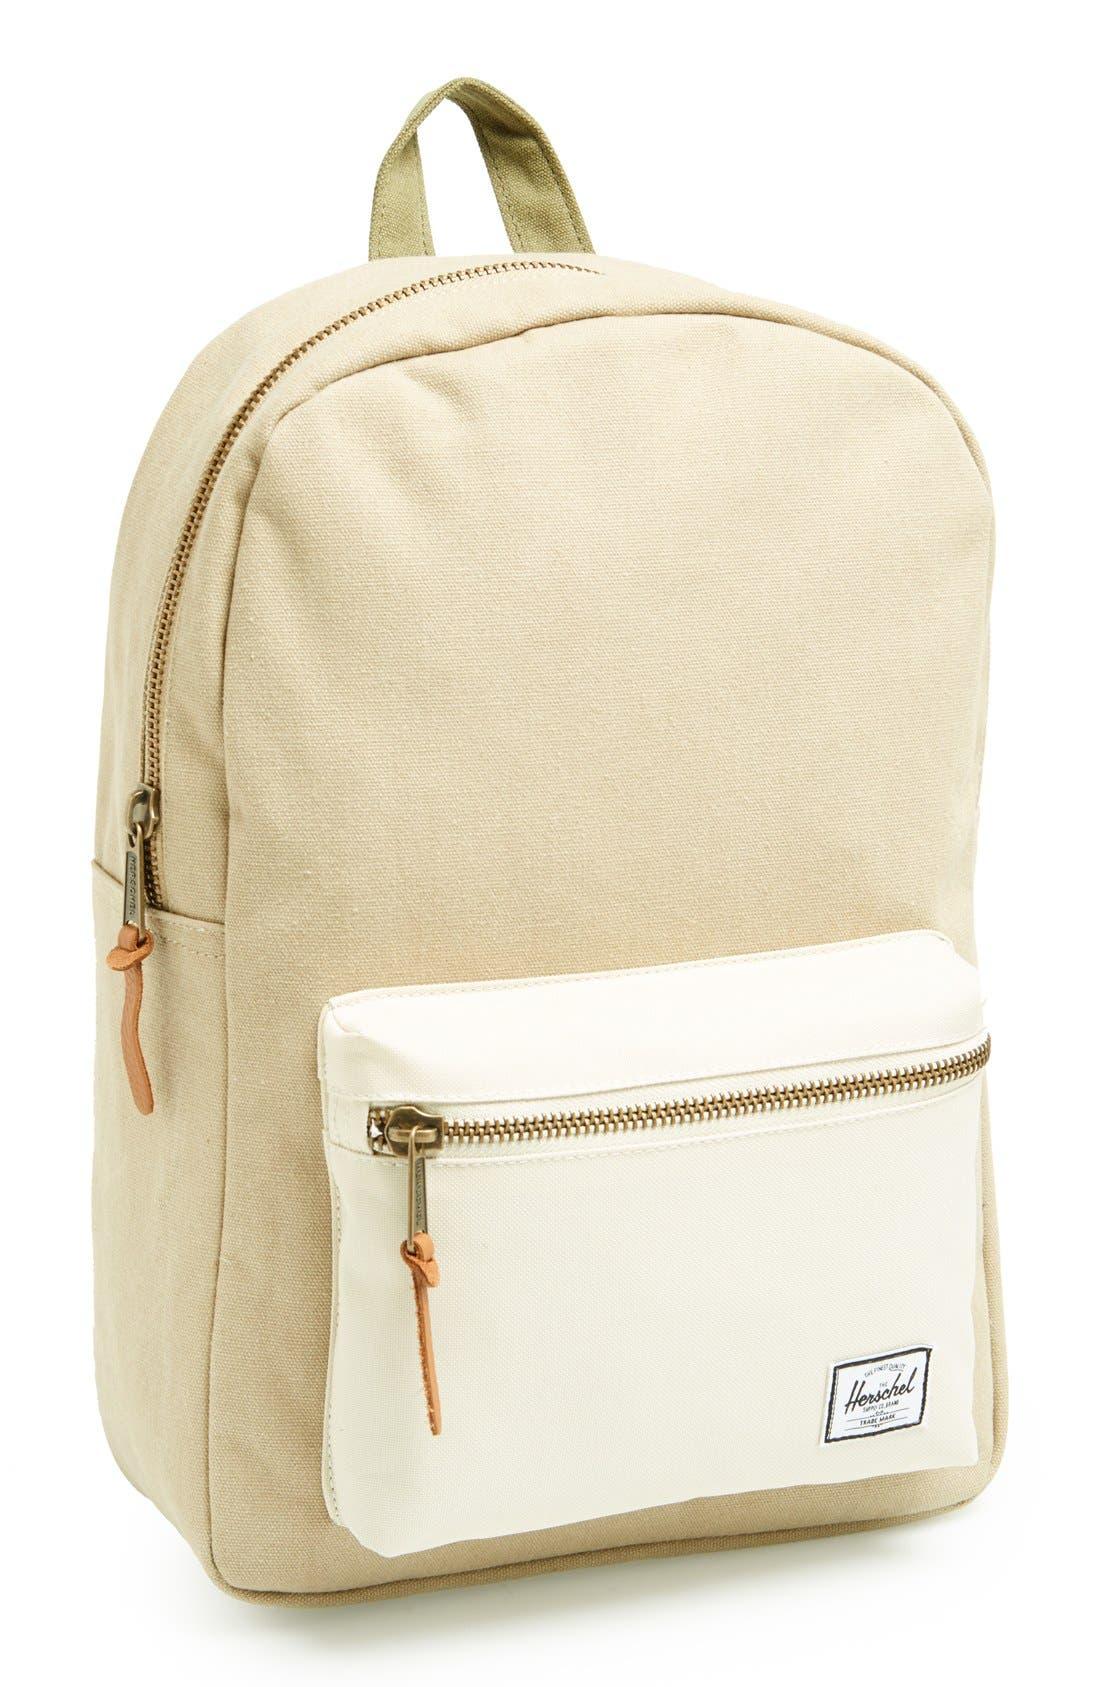 Alternate Image 1 Selected - Herschel Supply Co. 'Settlement Mid-Volume' Canvas Laptop Backpack (13 Inch)